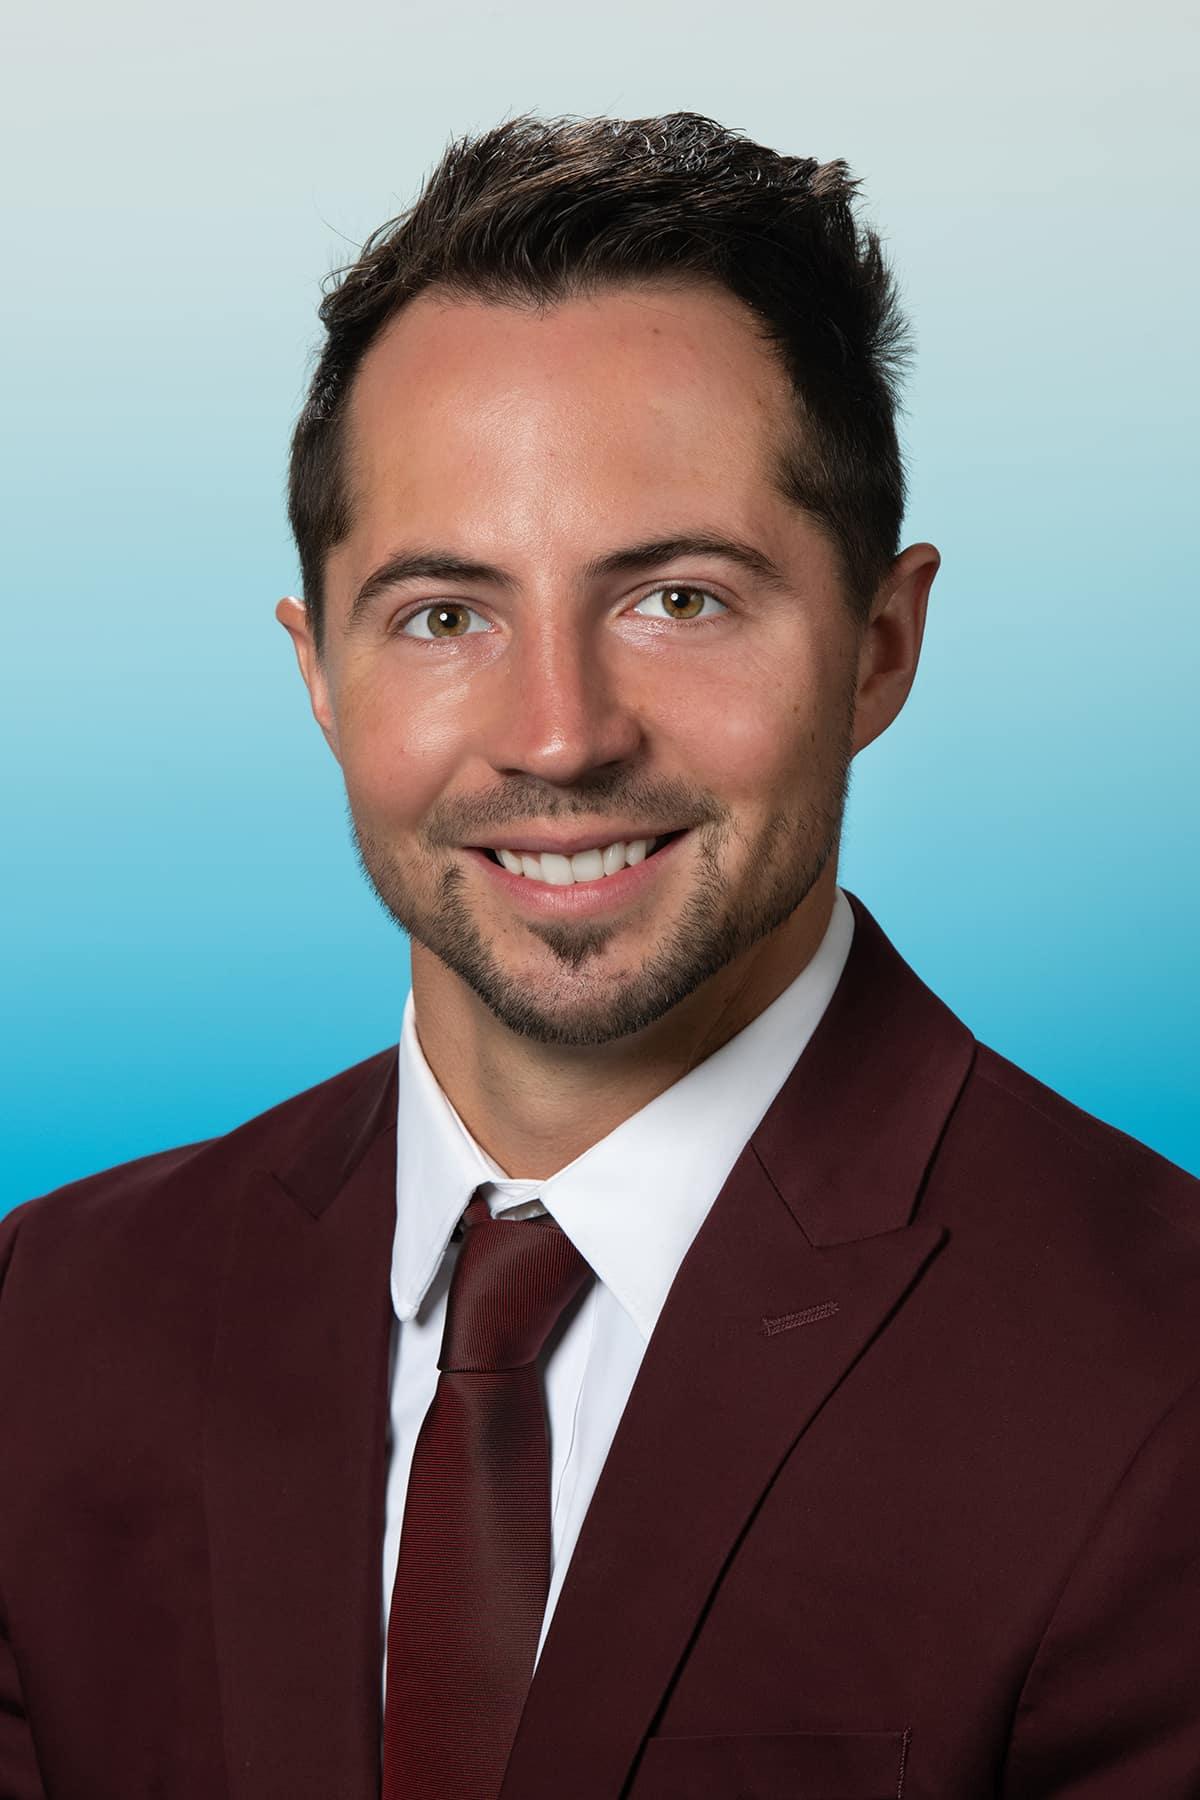 Justin Pastore